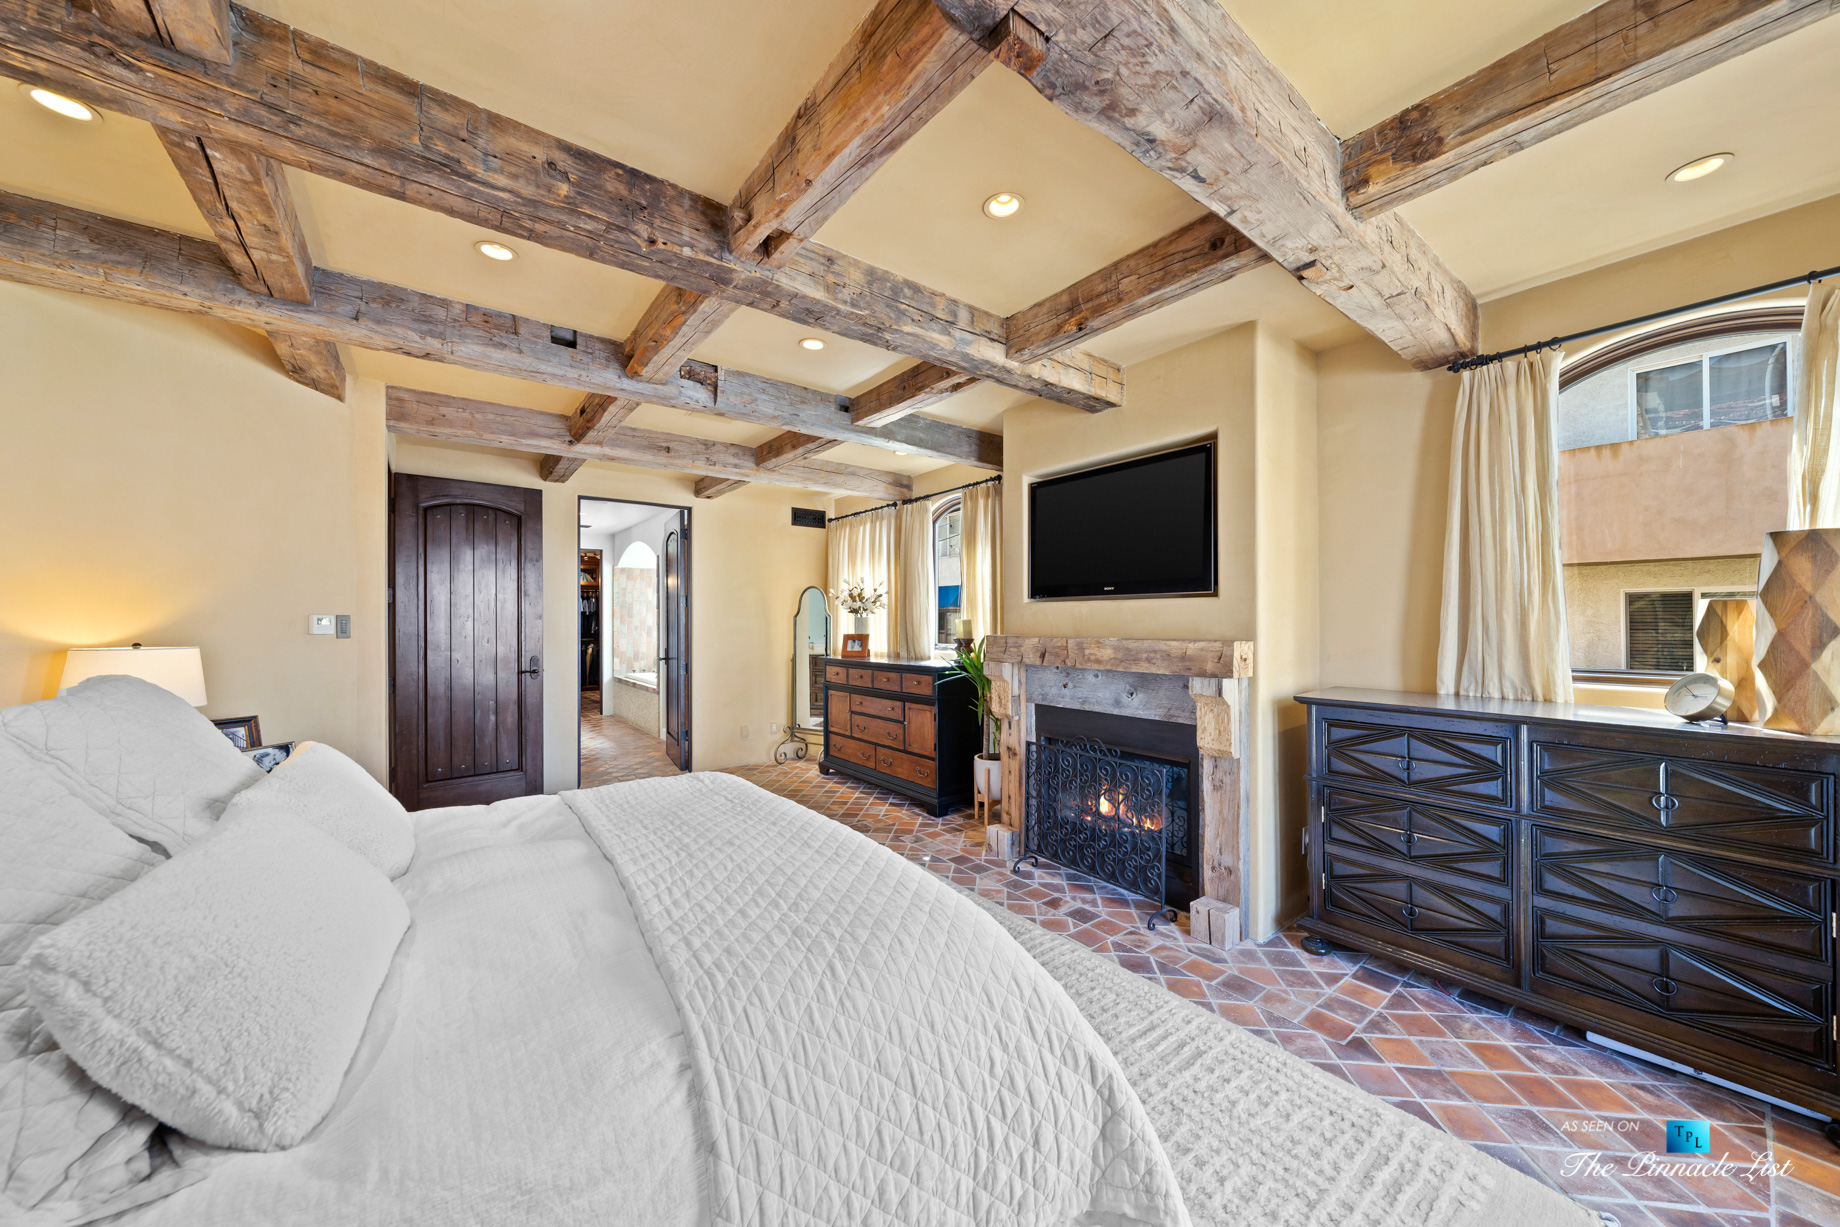 216 7th St, Manhattan Beach, CA, USA – Luxury Real Estate – Coastal Villa Home – Master Bedroom Fireplace